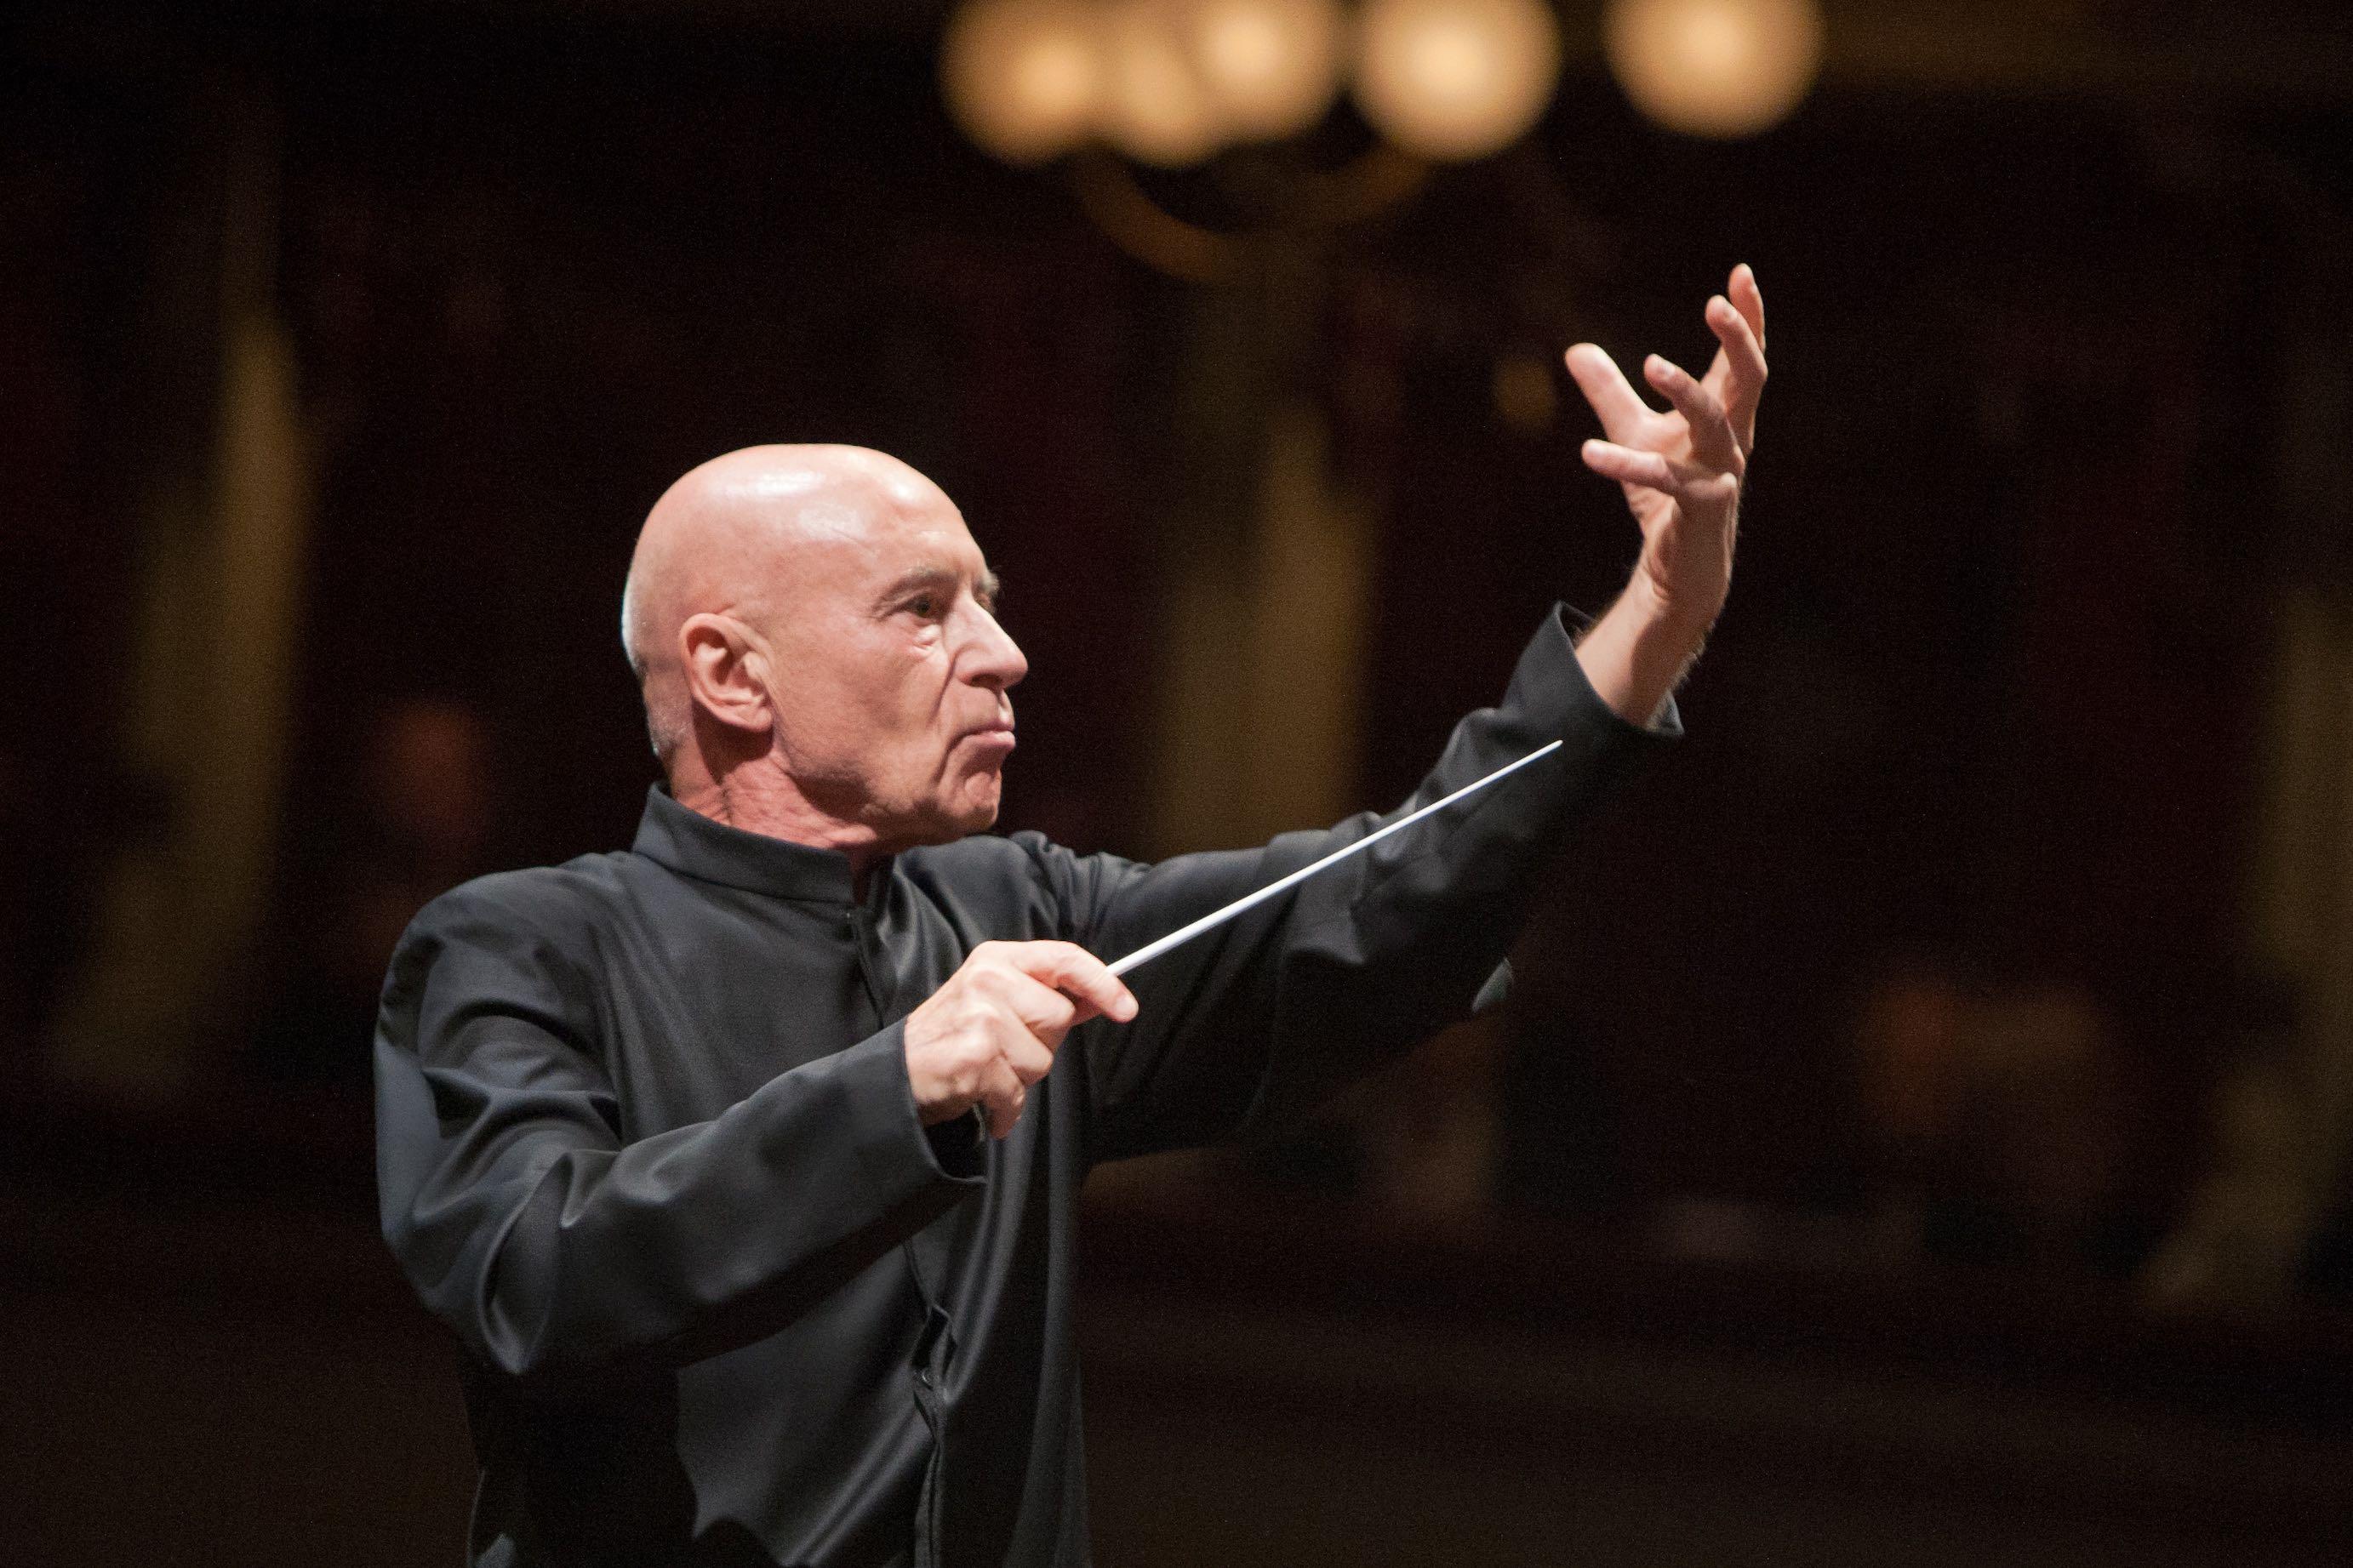 TEATRO ALLA SCALA, MILANO, Christoph Eschenbach, Tzimon Barto, Fryderyk Franciszek Chopin, Gershwin, Dvořák